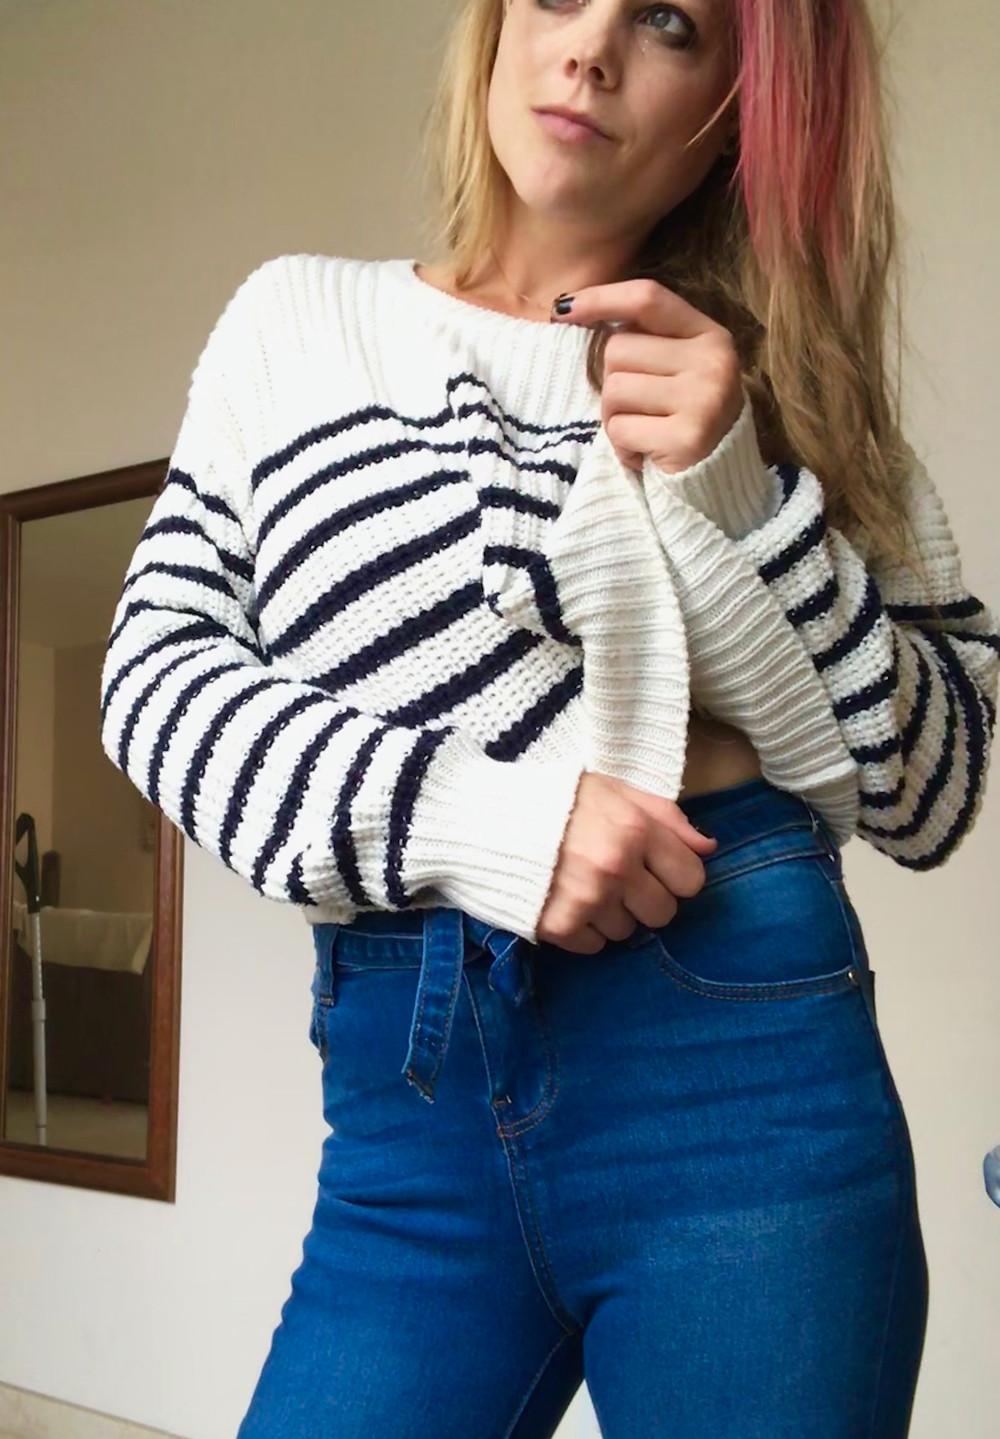 Blue High Waist Paper Bag Skinny Jeans: